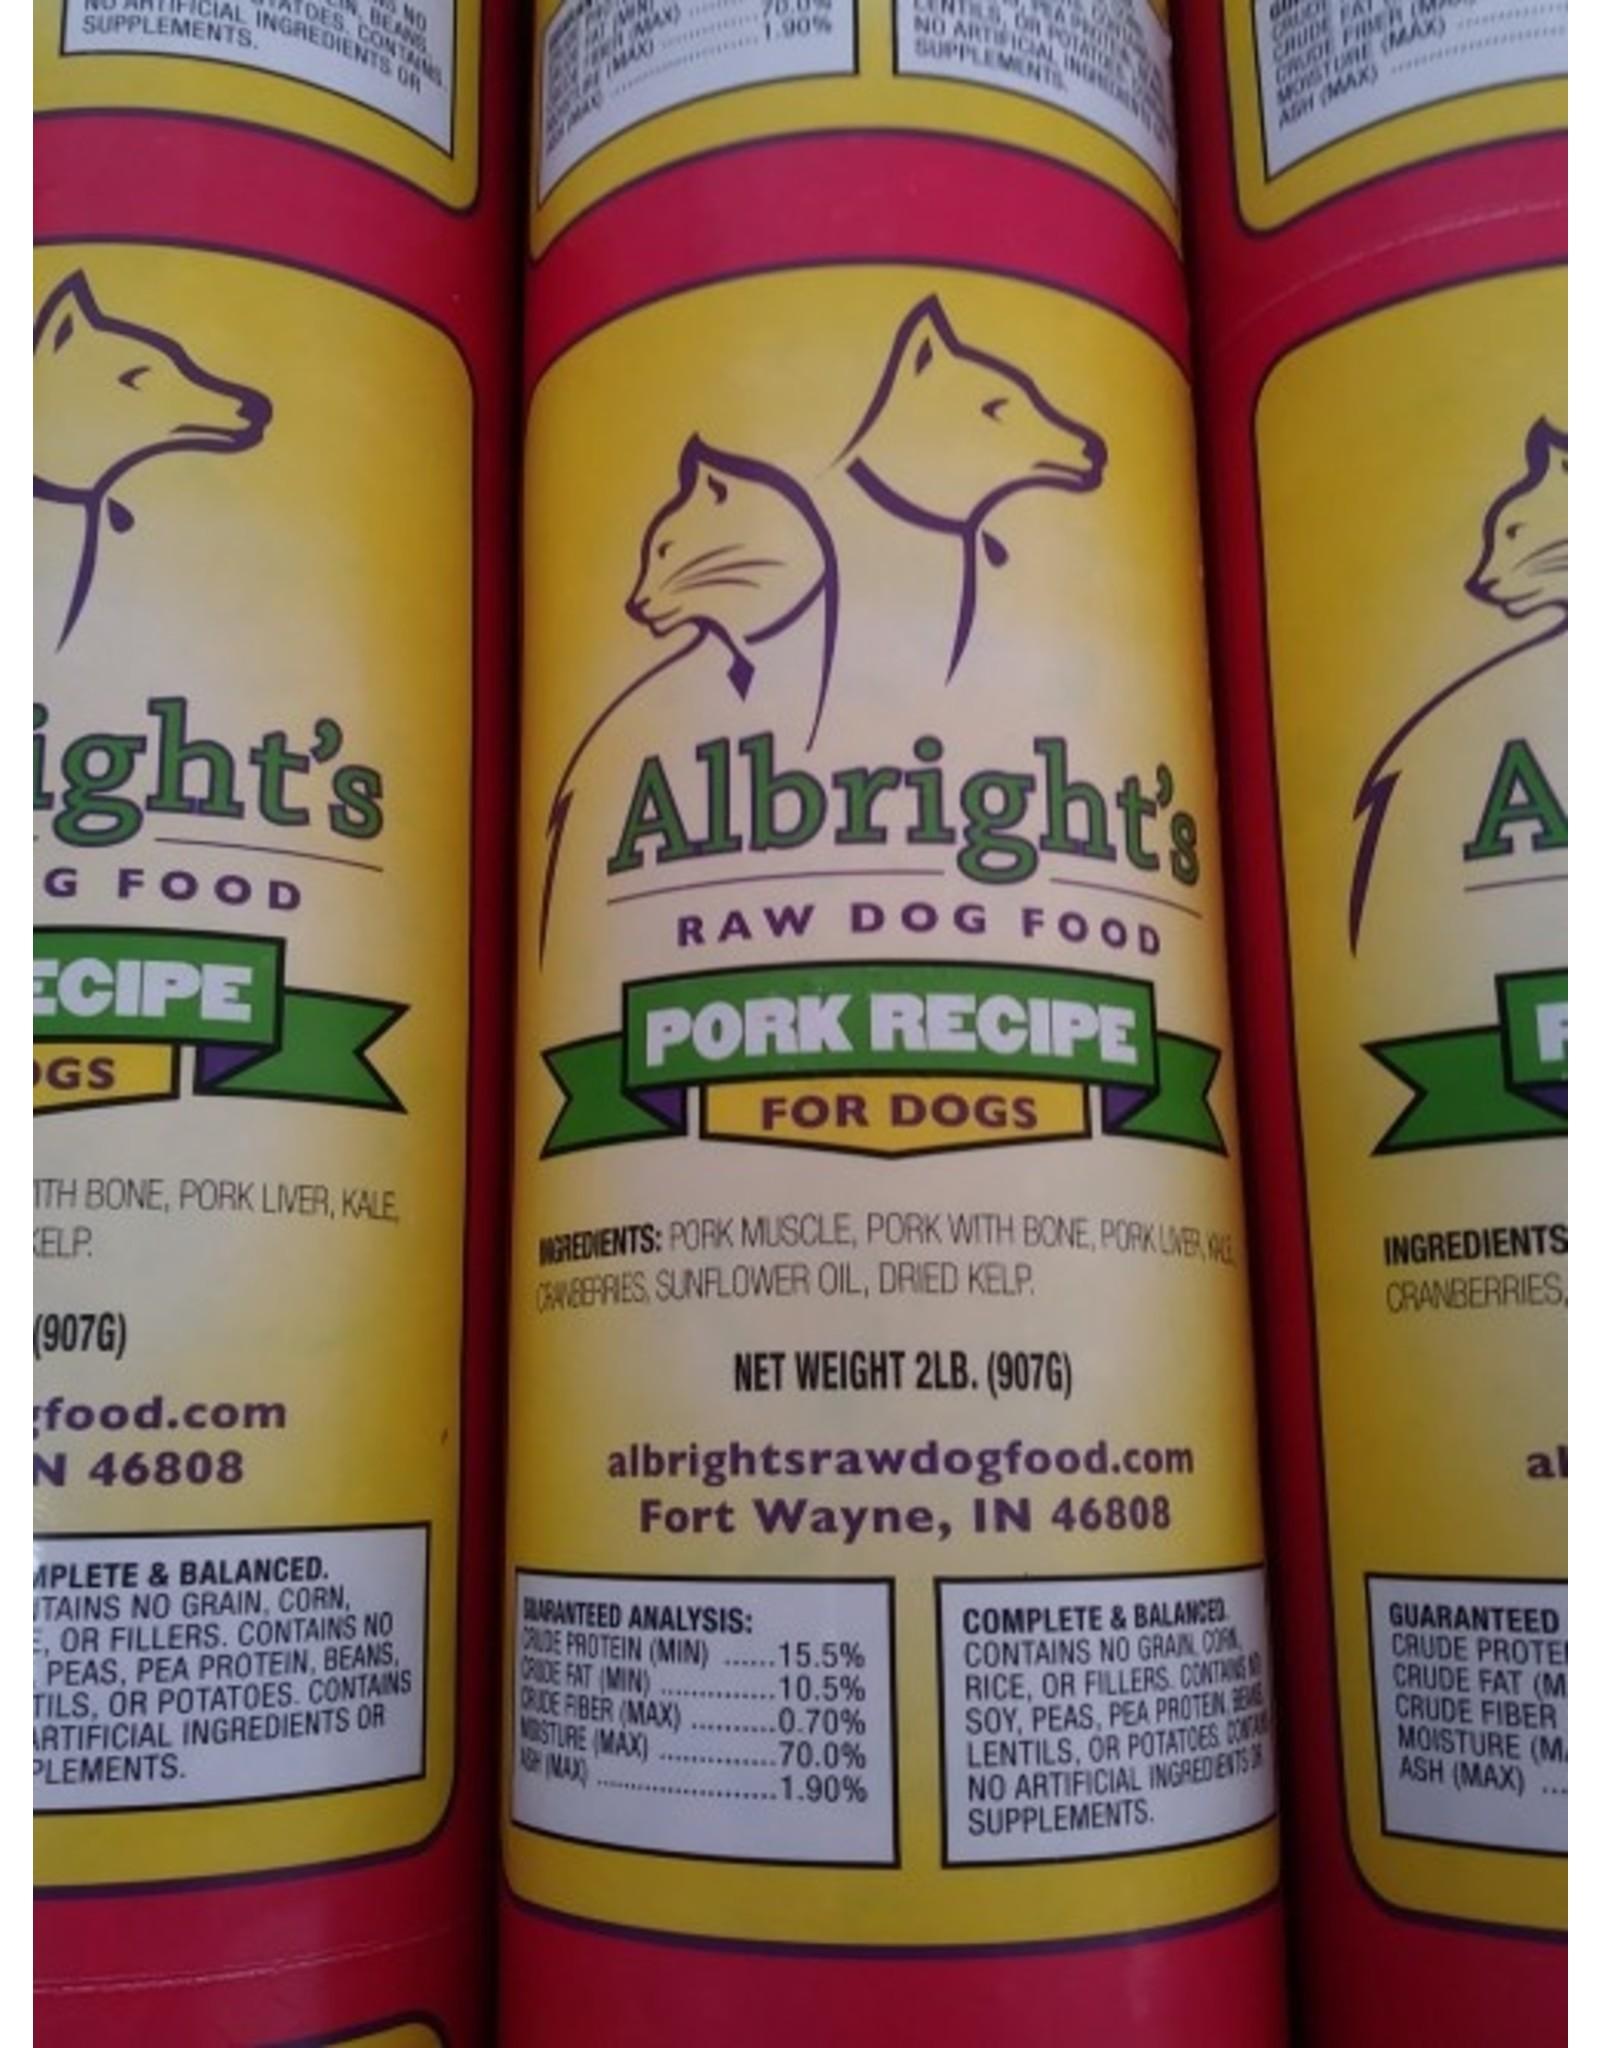 Albrights Albright's Frozen Raw Dog Food Pork Recipe Chub 2lb